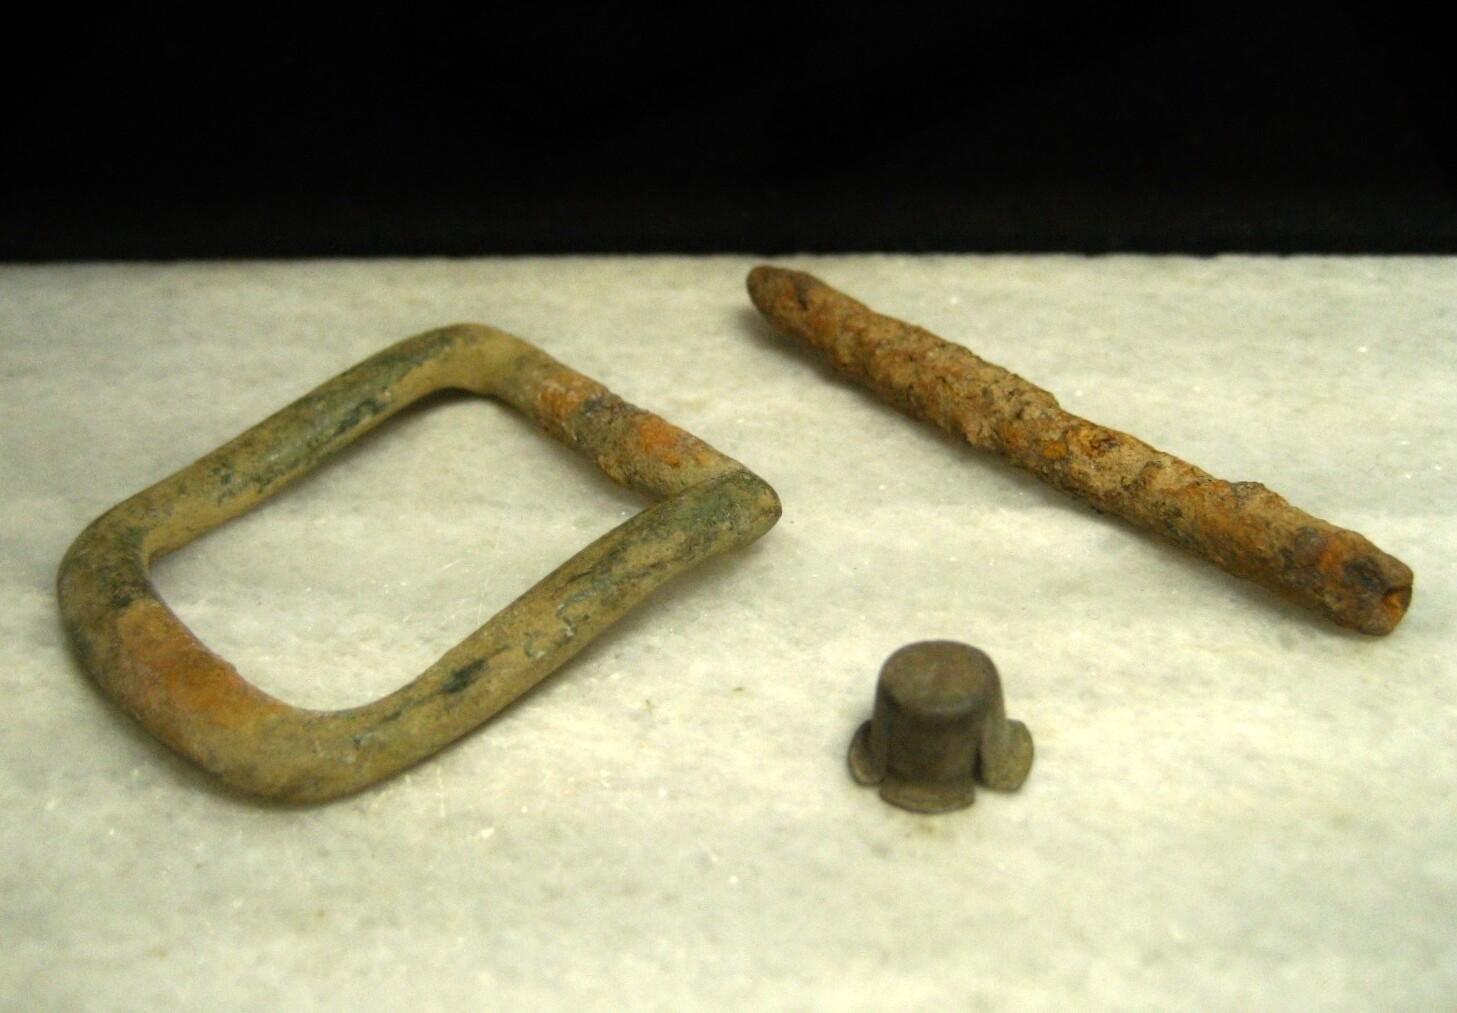 JUST ADDED ON 11/13 - ANTIETAM / BURNSIDE'S BRIDGE - 3 Relics Including a Percussion Cap